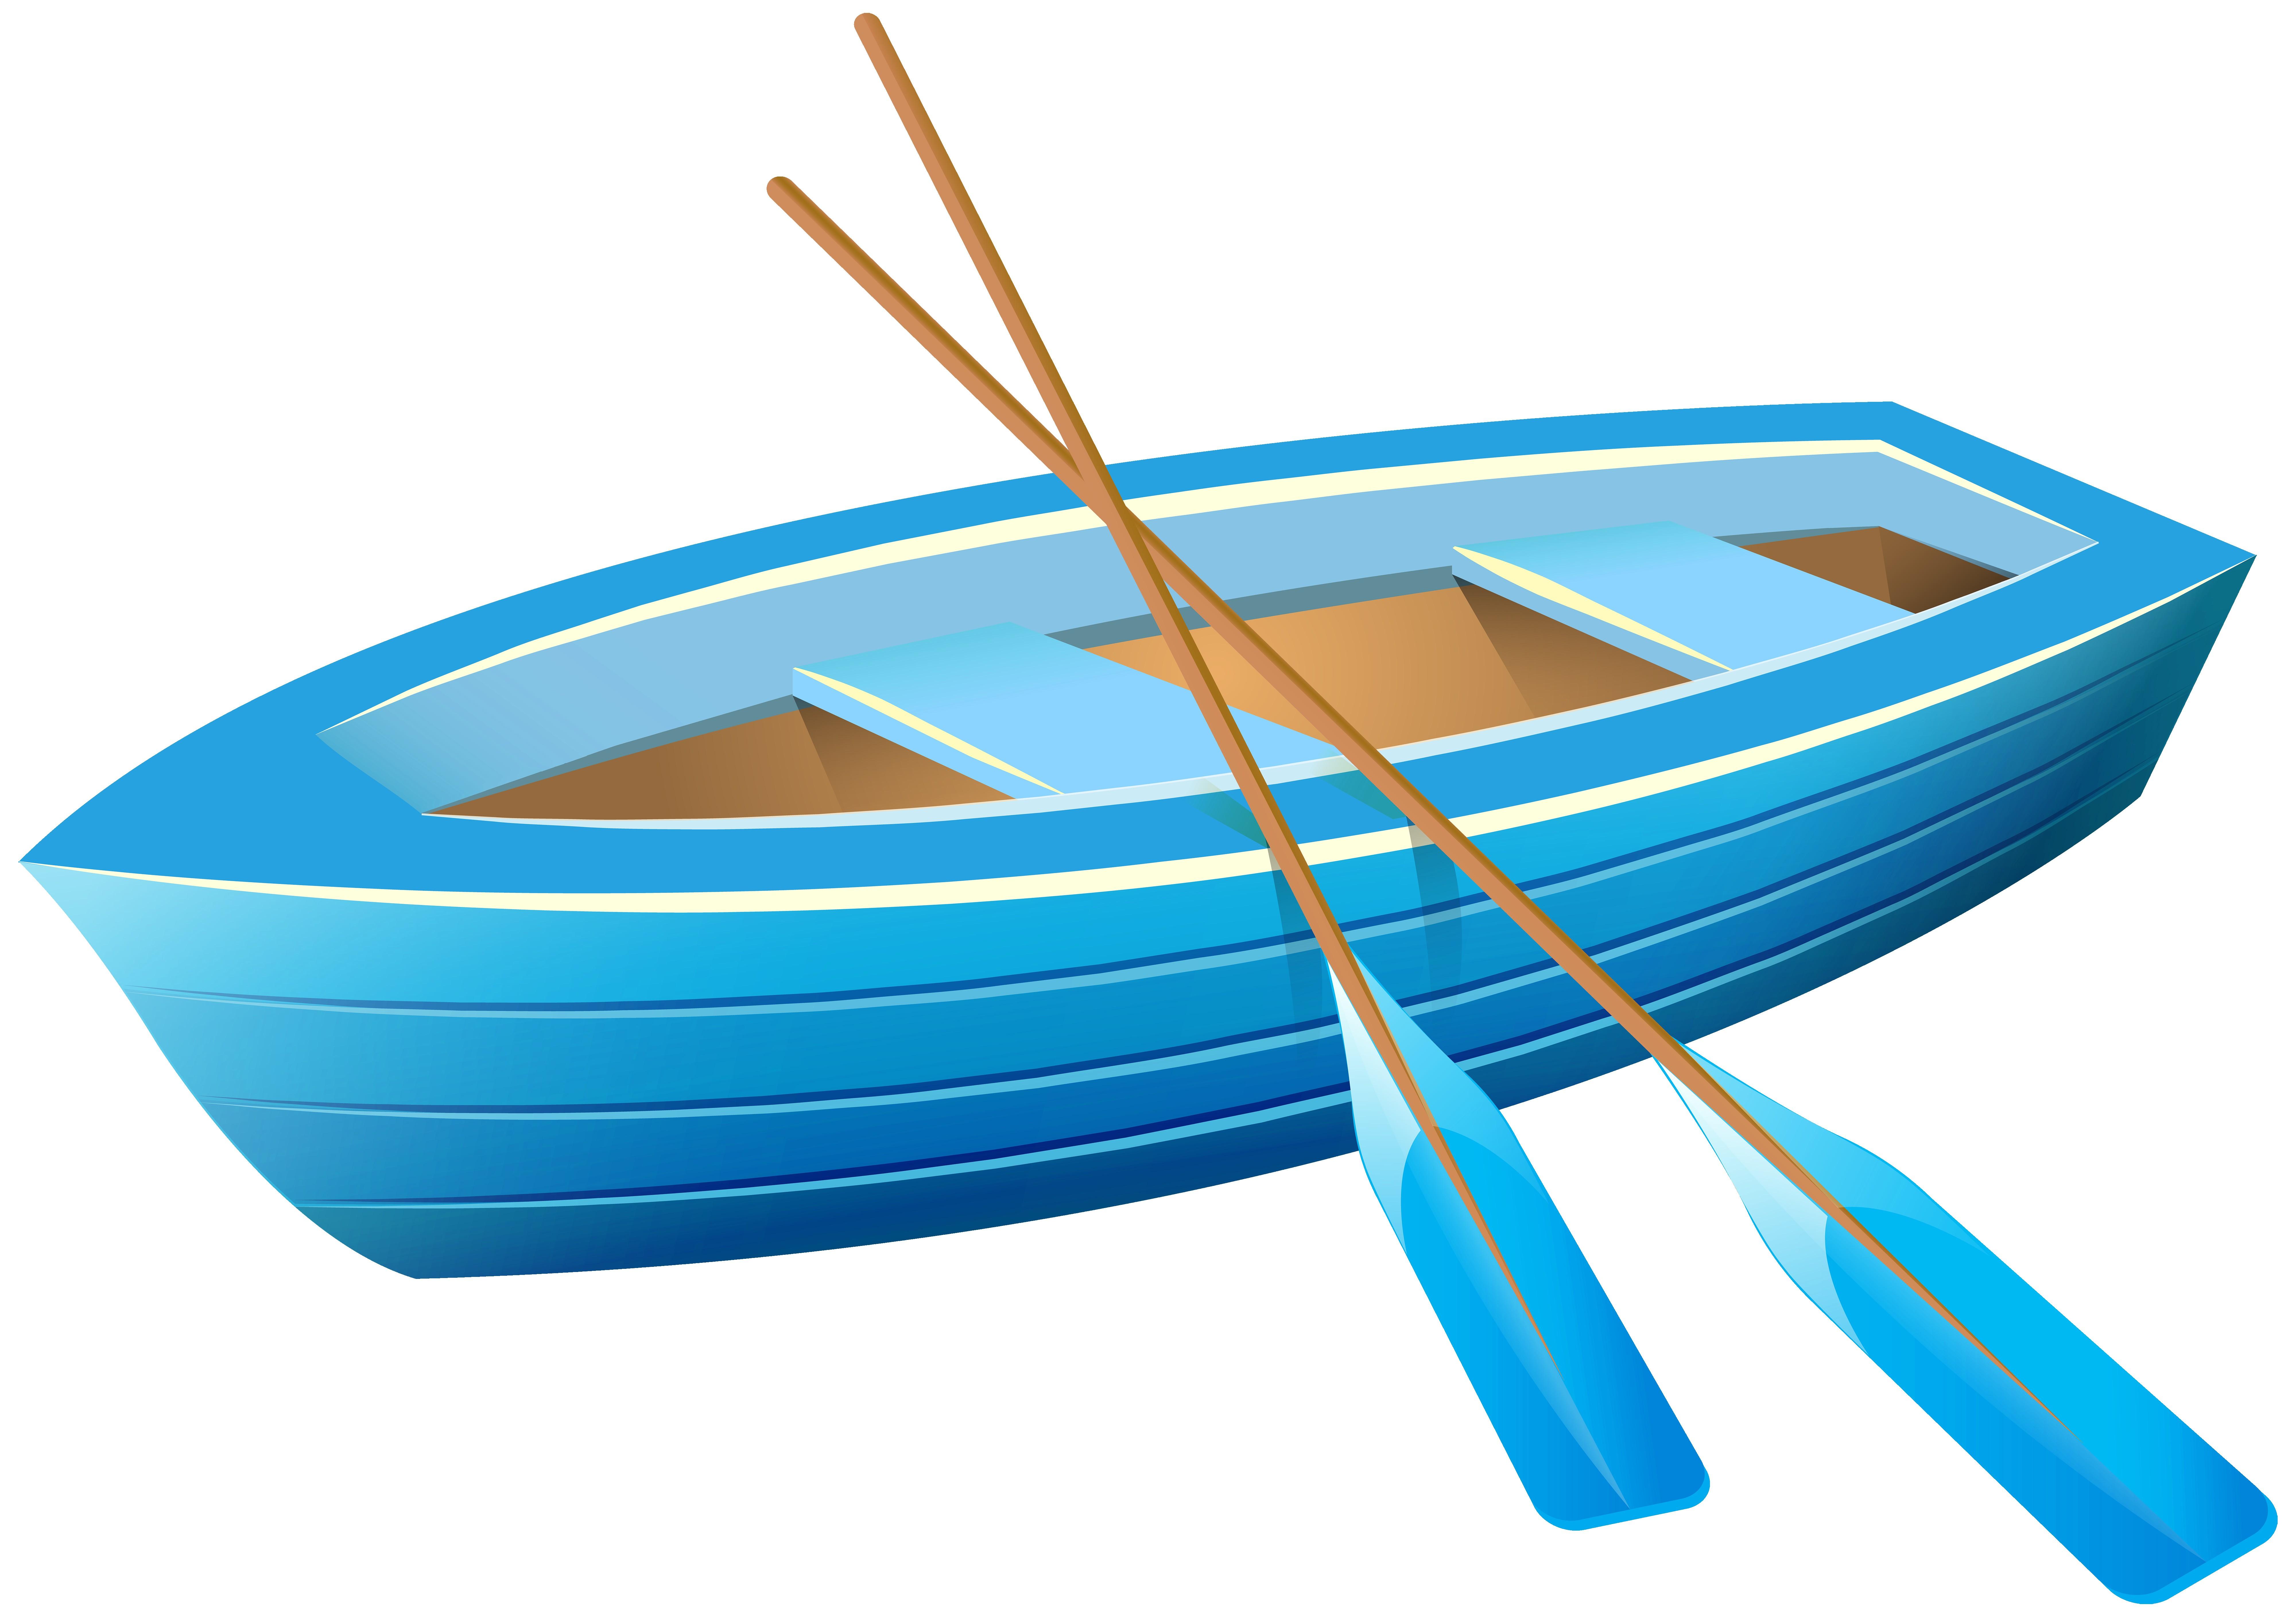 Free photo: Boat clipart.